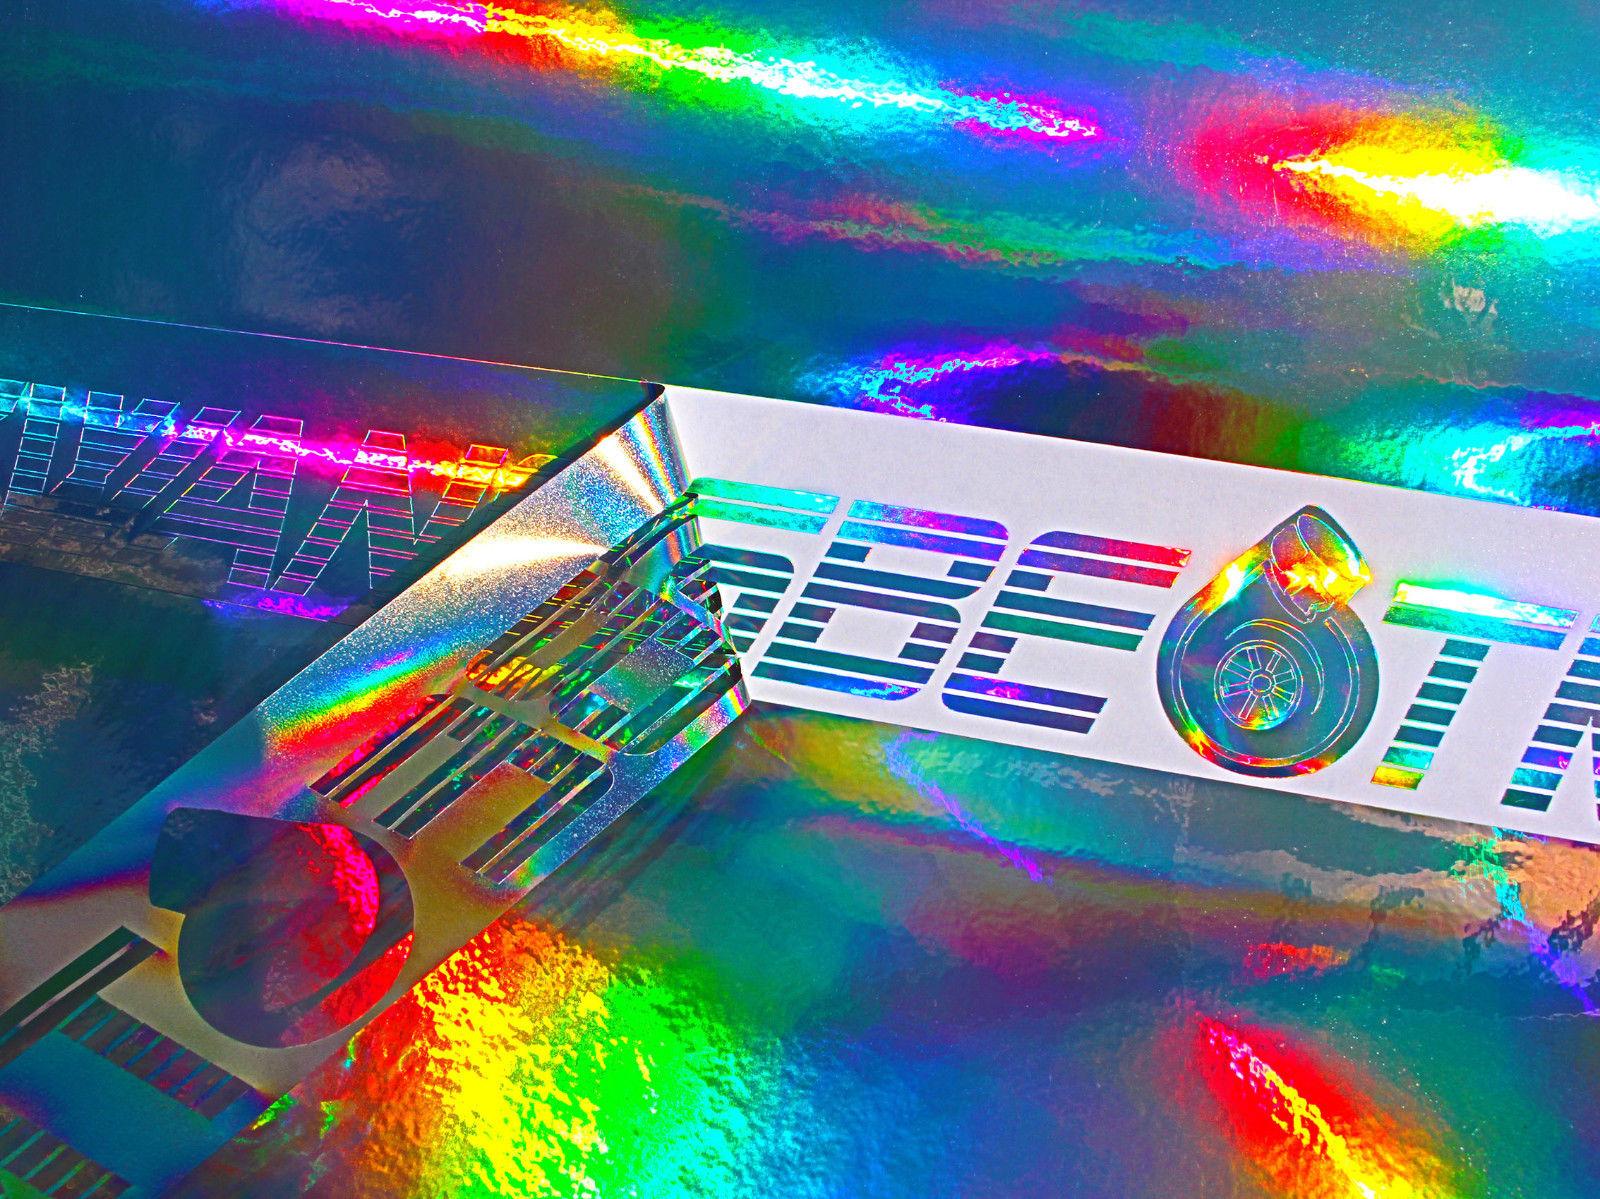 19-49-26-20-m-Plotterfolie-Hologramm-Oilslick-Folie-Aufkleber-Plottfolie Indexbild 11